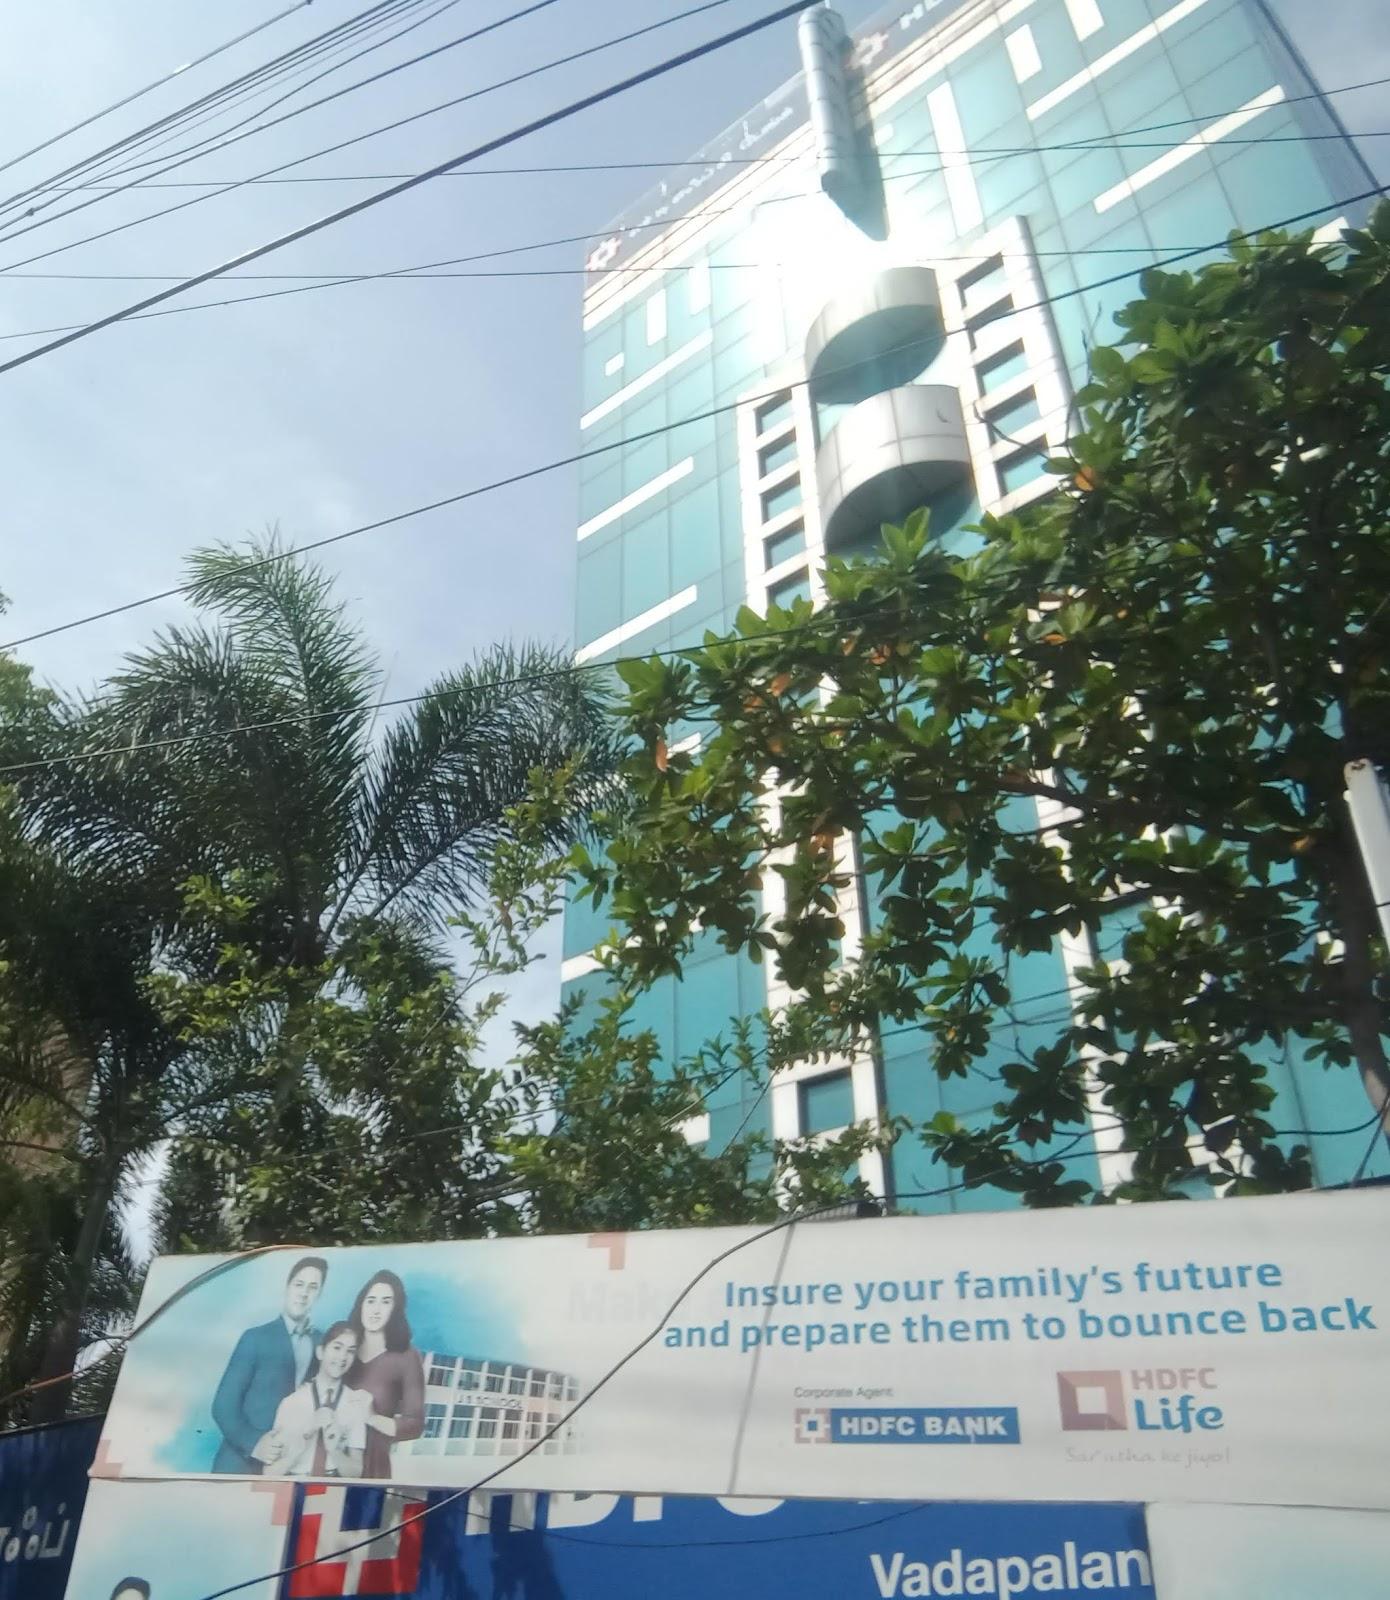 blood bank HDFC Bank ATM near Chennai Tamil Nadu